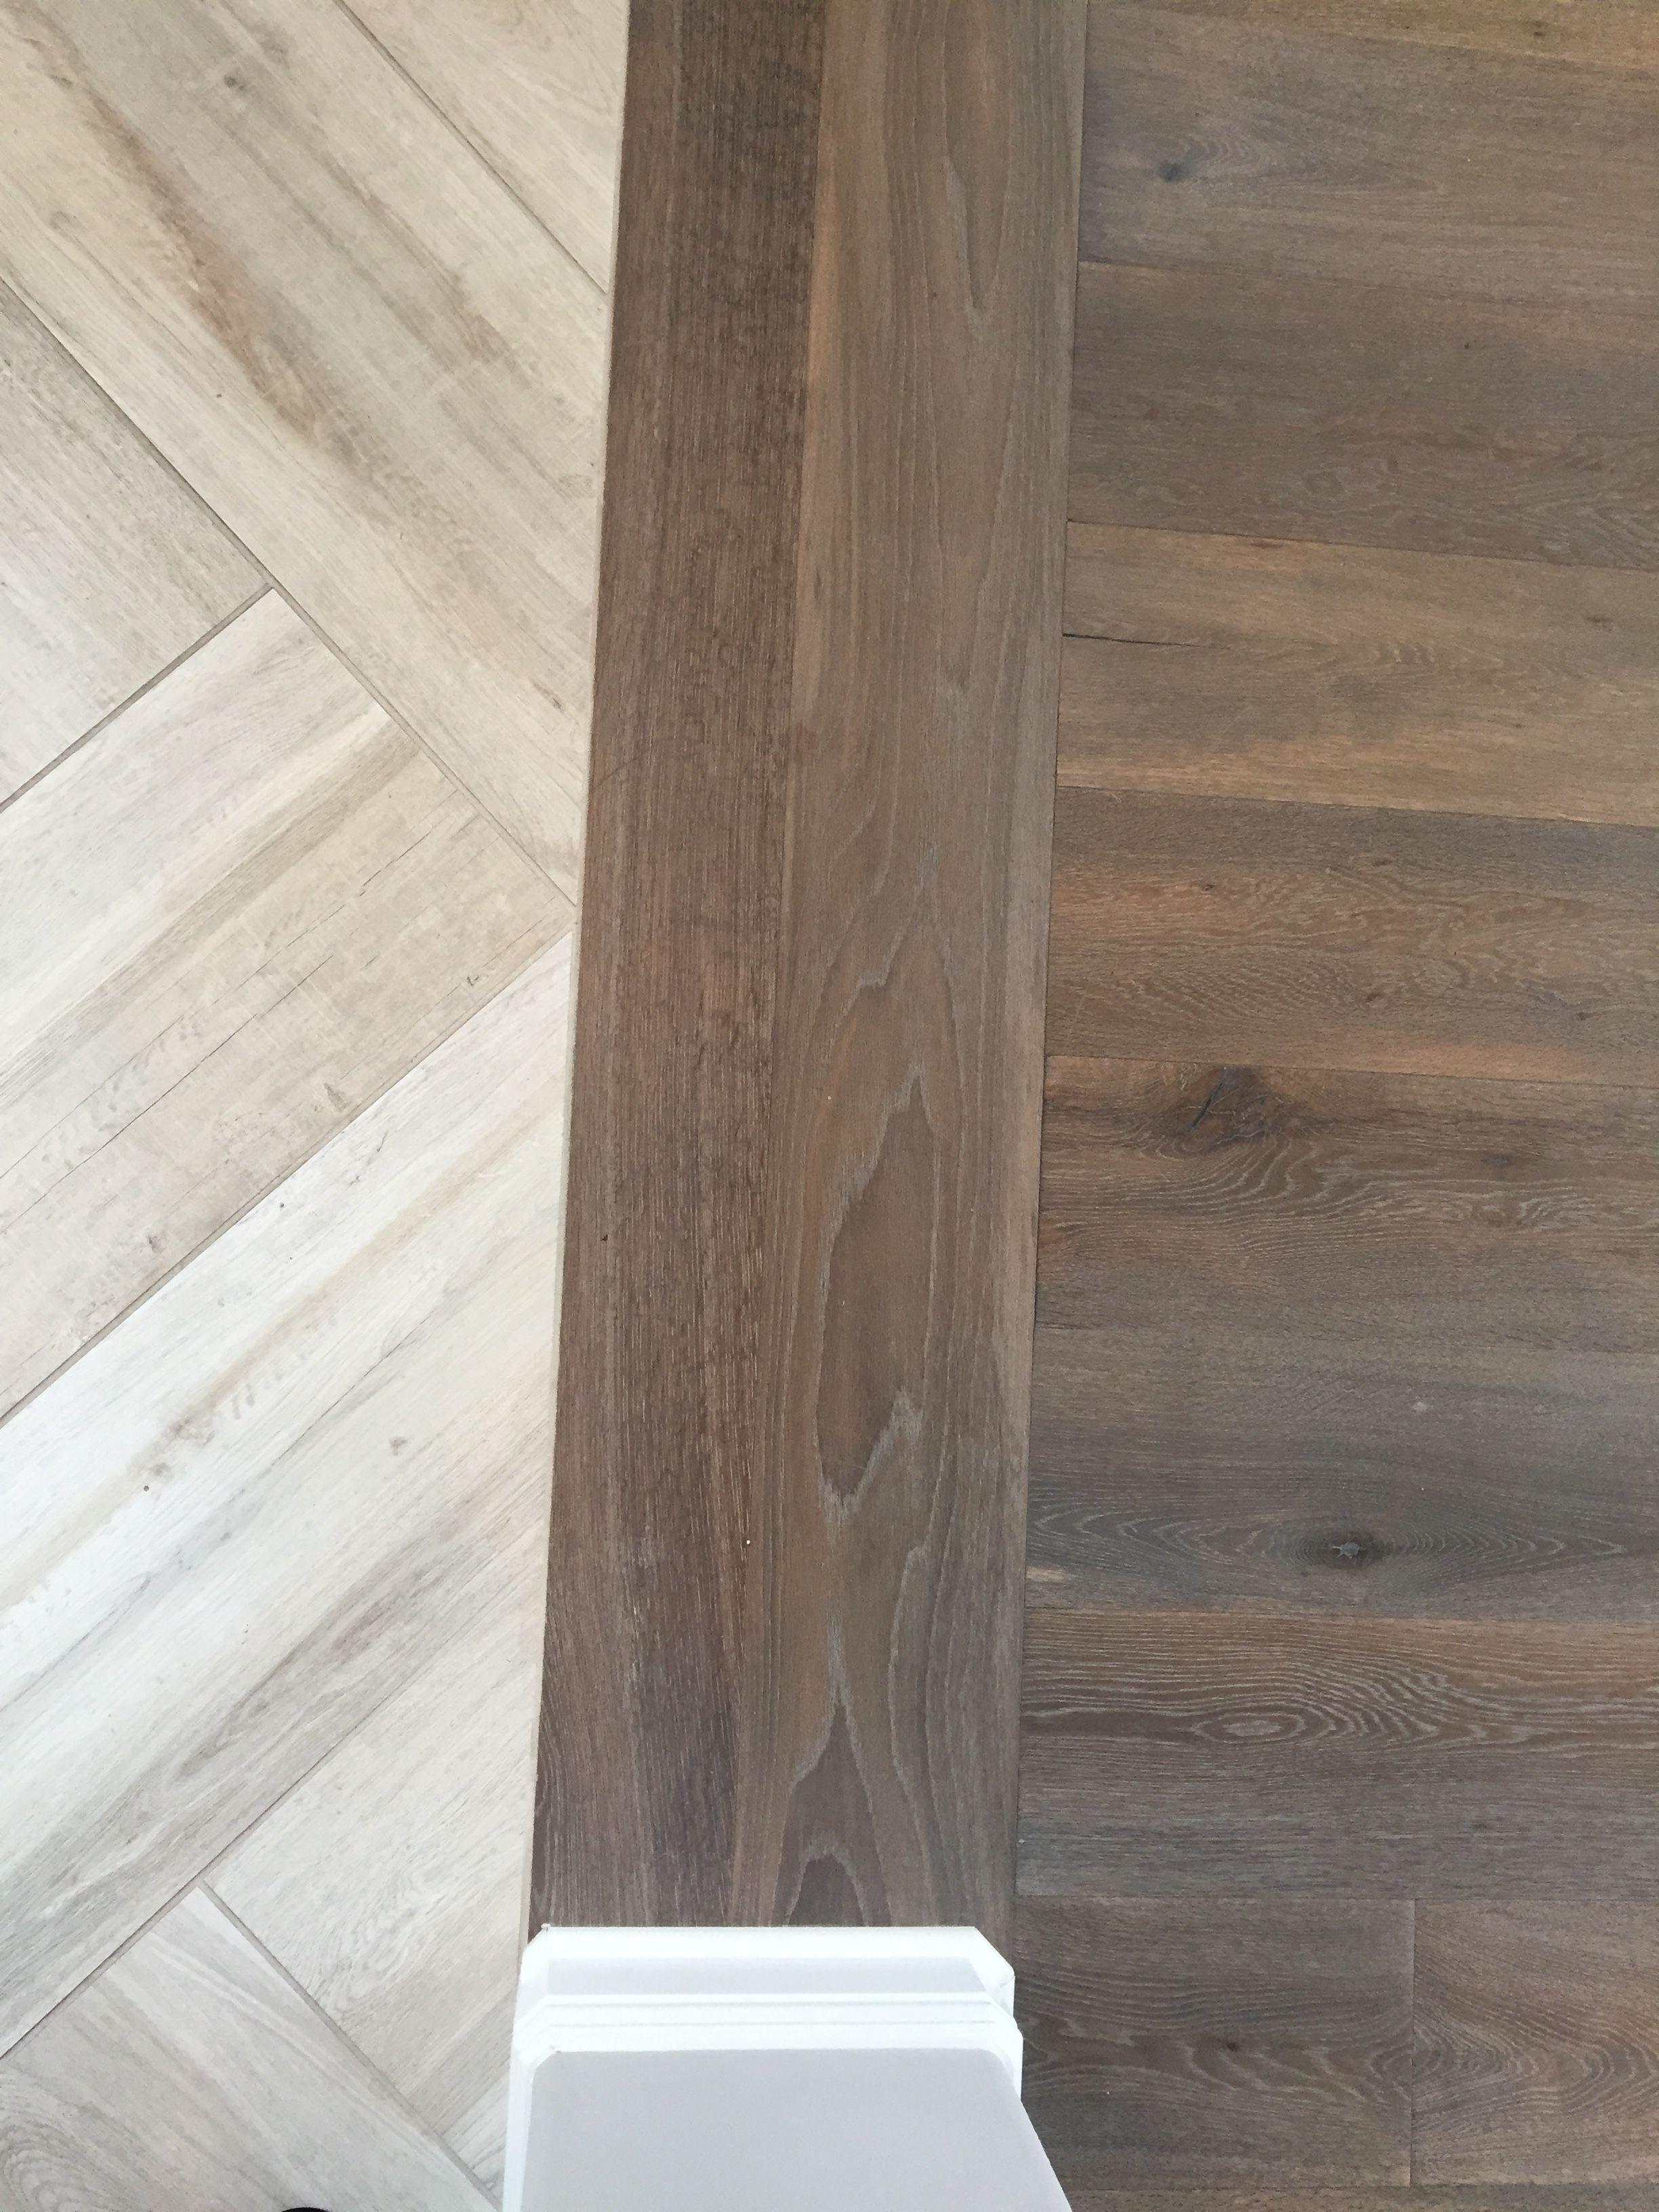 bruce maple cherry hardwood flooring of floor transition laminate to herringbone tile pattern model throughout floor transition laminate to herringbone tile pattern herringbone tile pattern herringbone wood floor